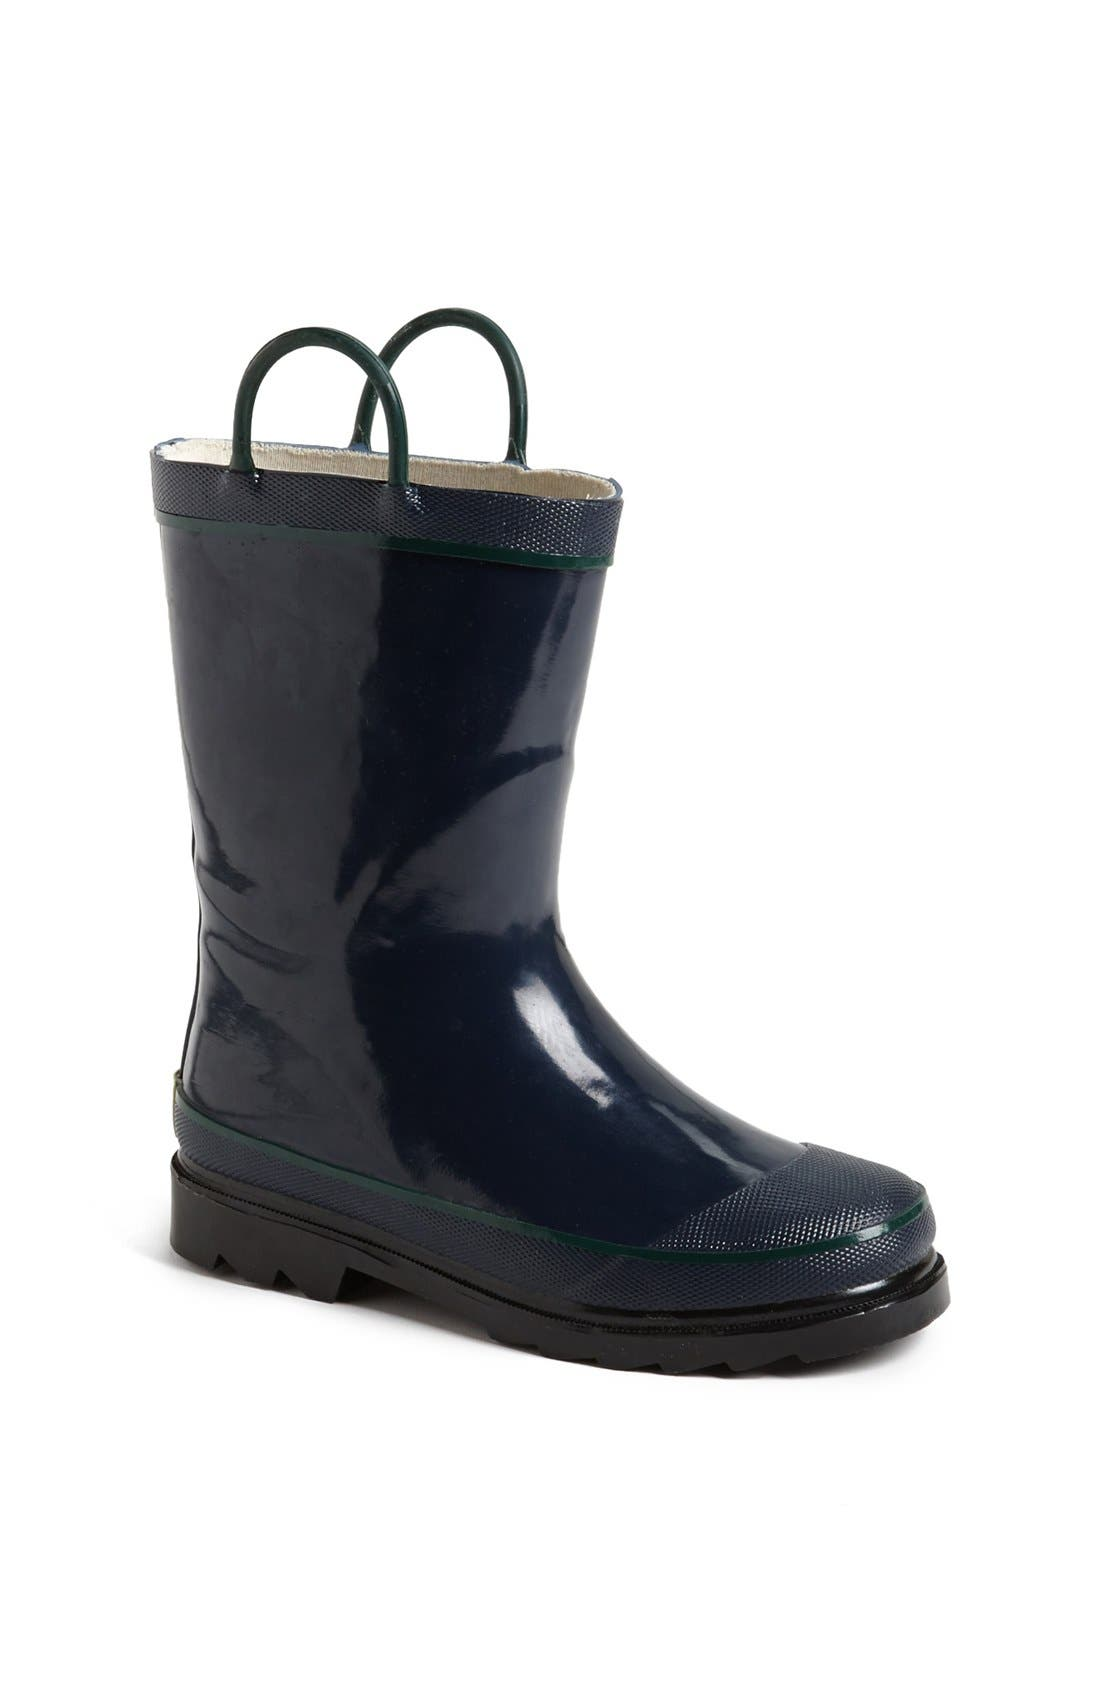 Nordstrom 'Firechief 2' Rain Boot WESTERN CHIEF $24.95